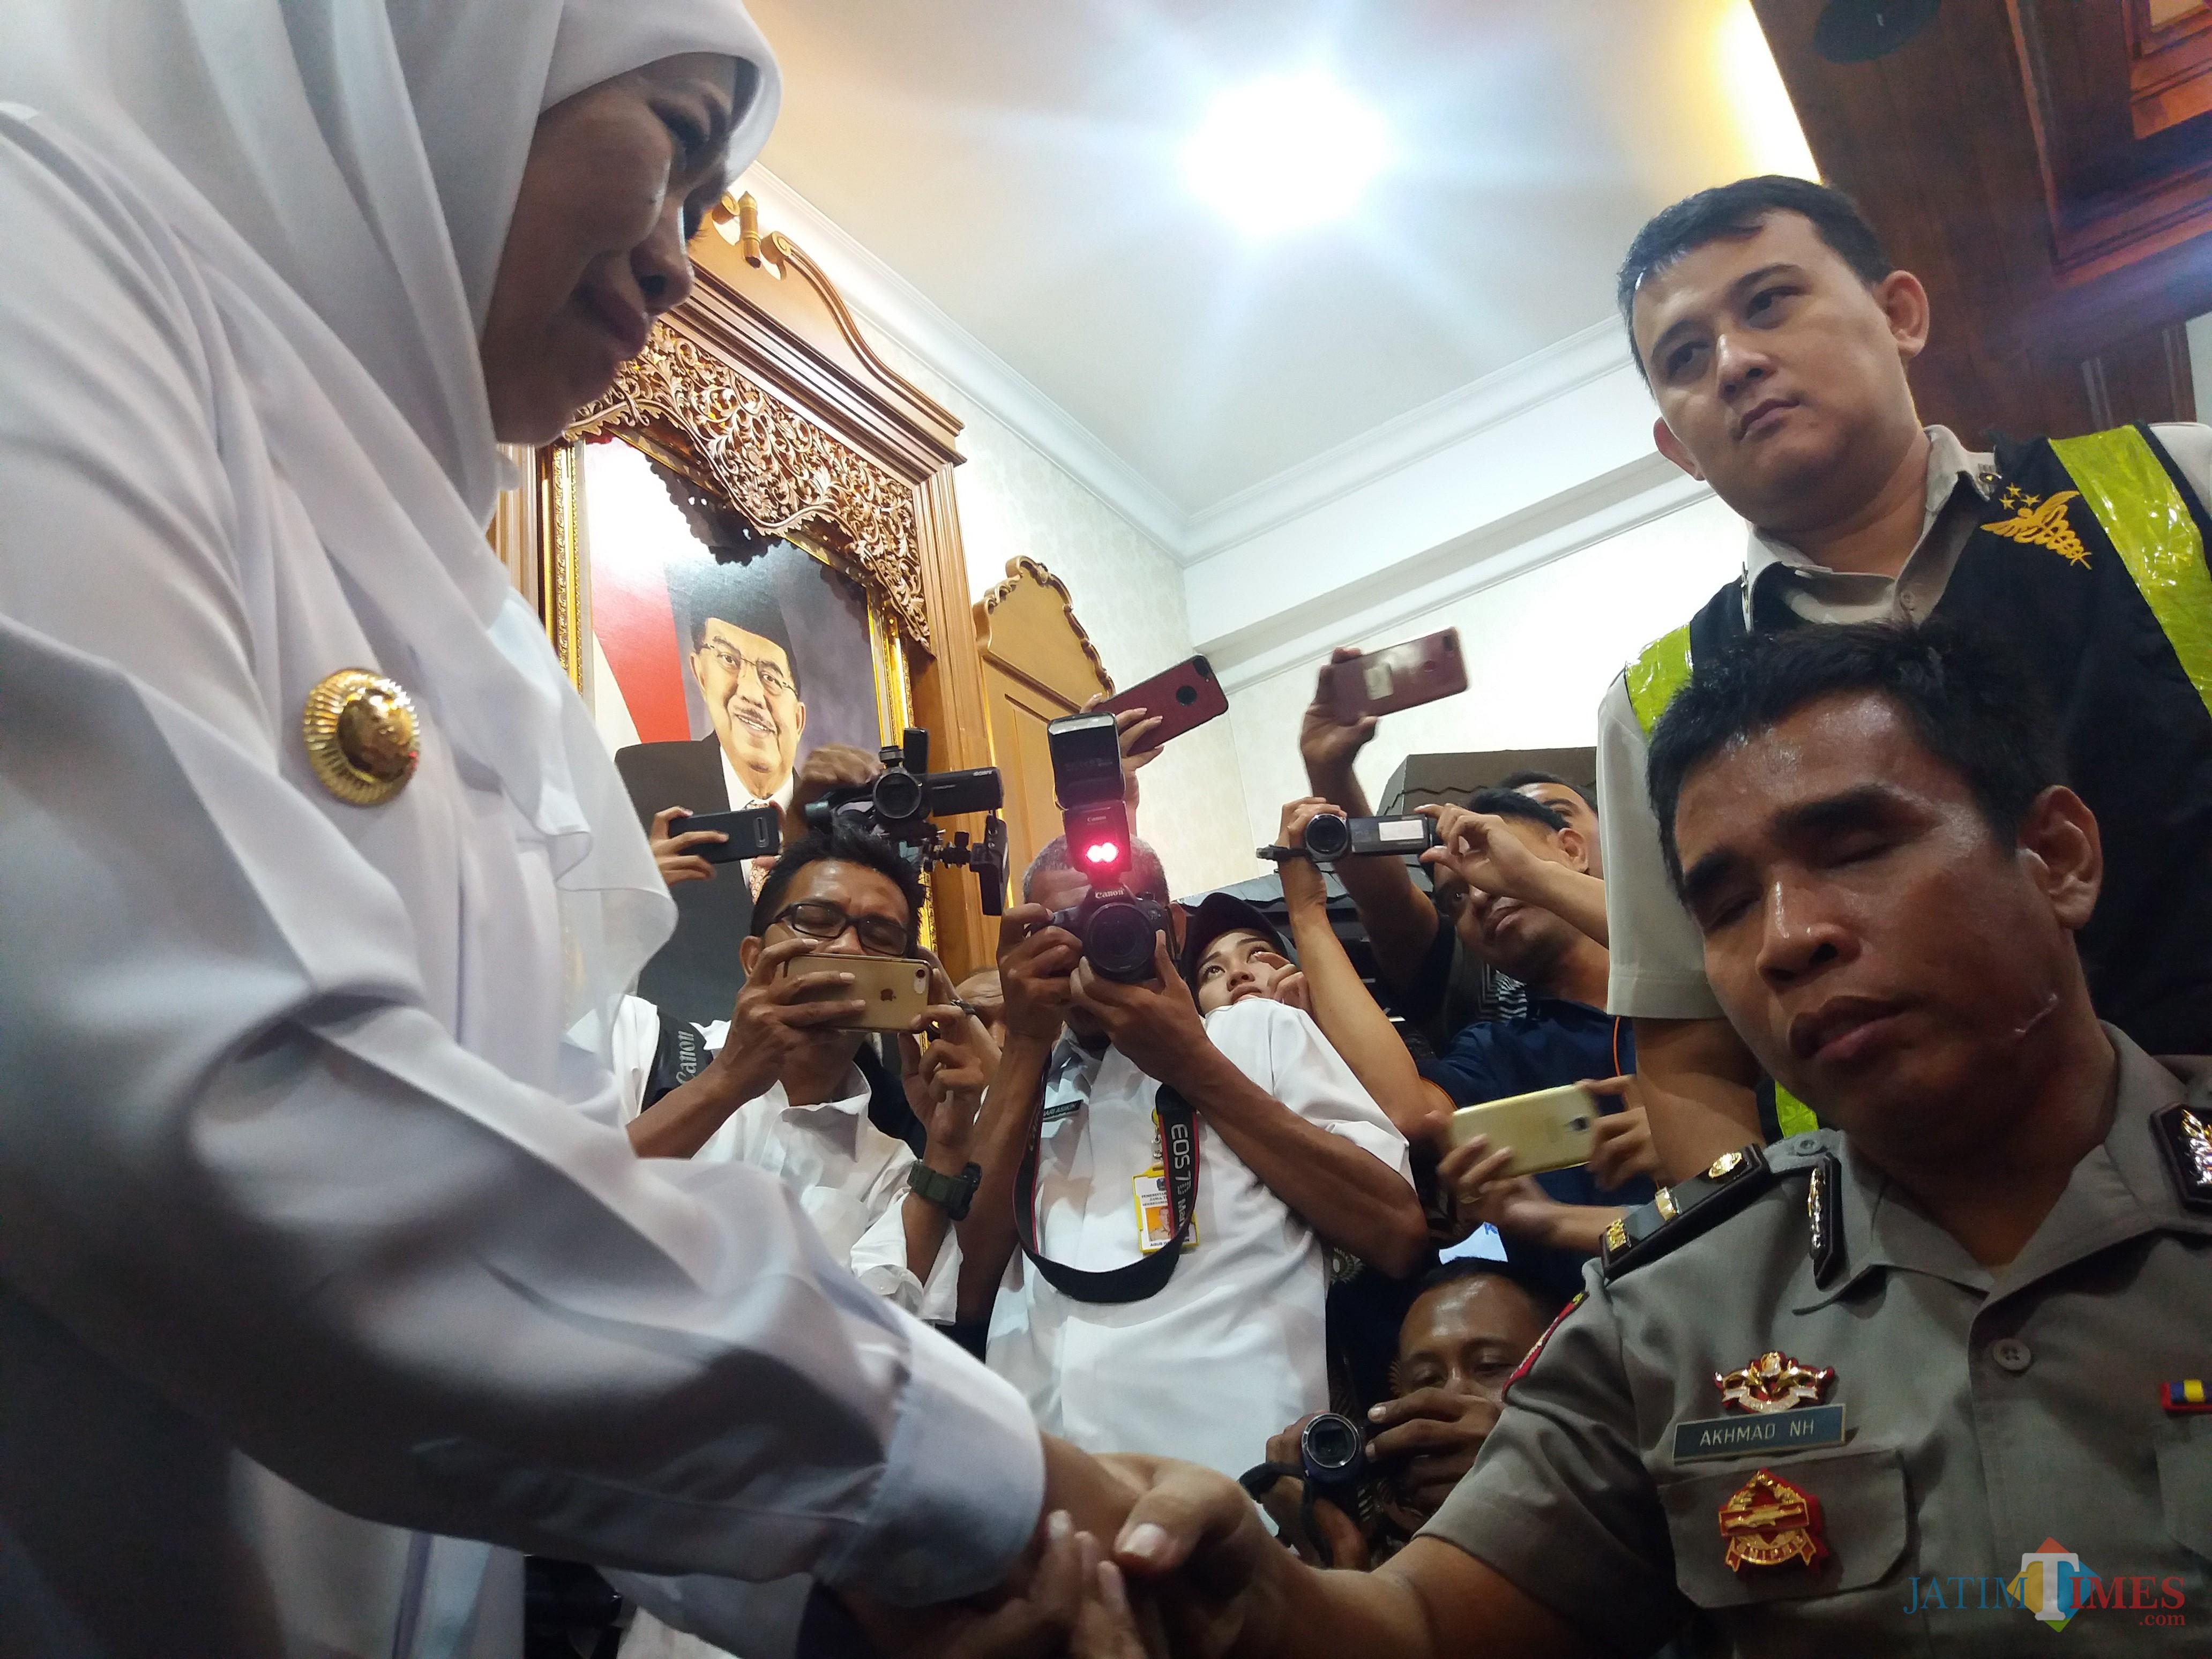 Korban Ipda Nurhadi ketika disapa oleh Gubernur Jatim Khofifah